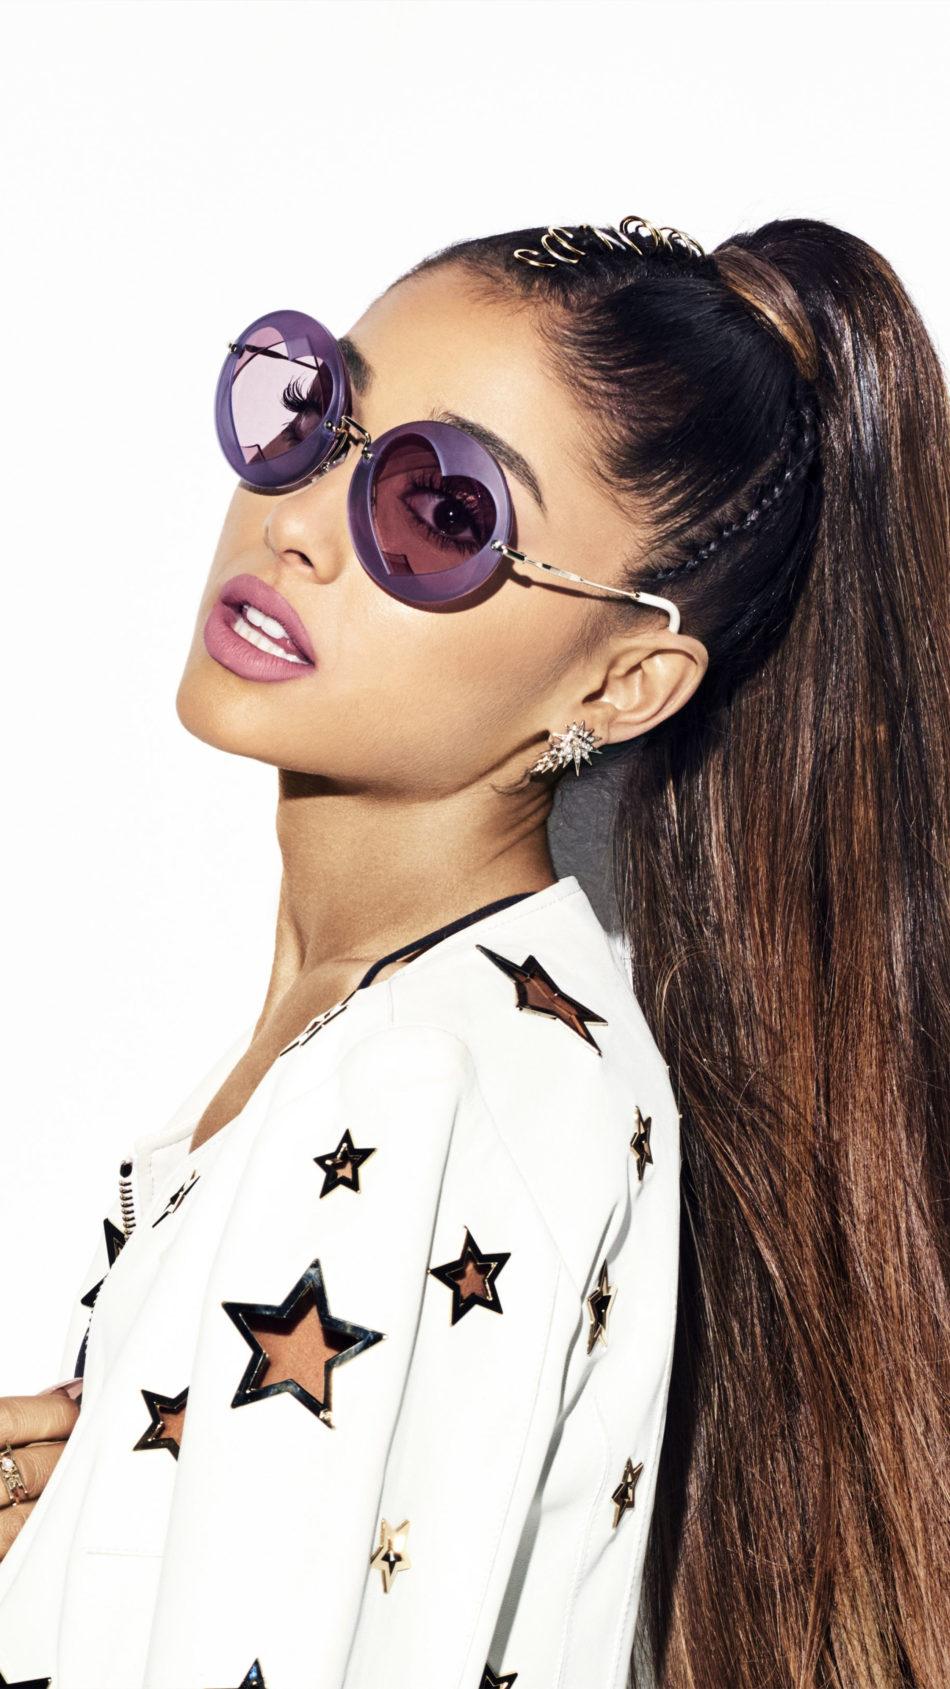 Ariana Grande 2020 Heart Sunglasses 4K Ultra HD Mobile Wallpaper